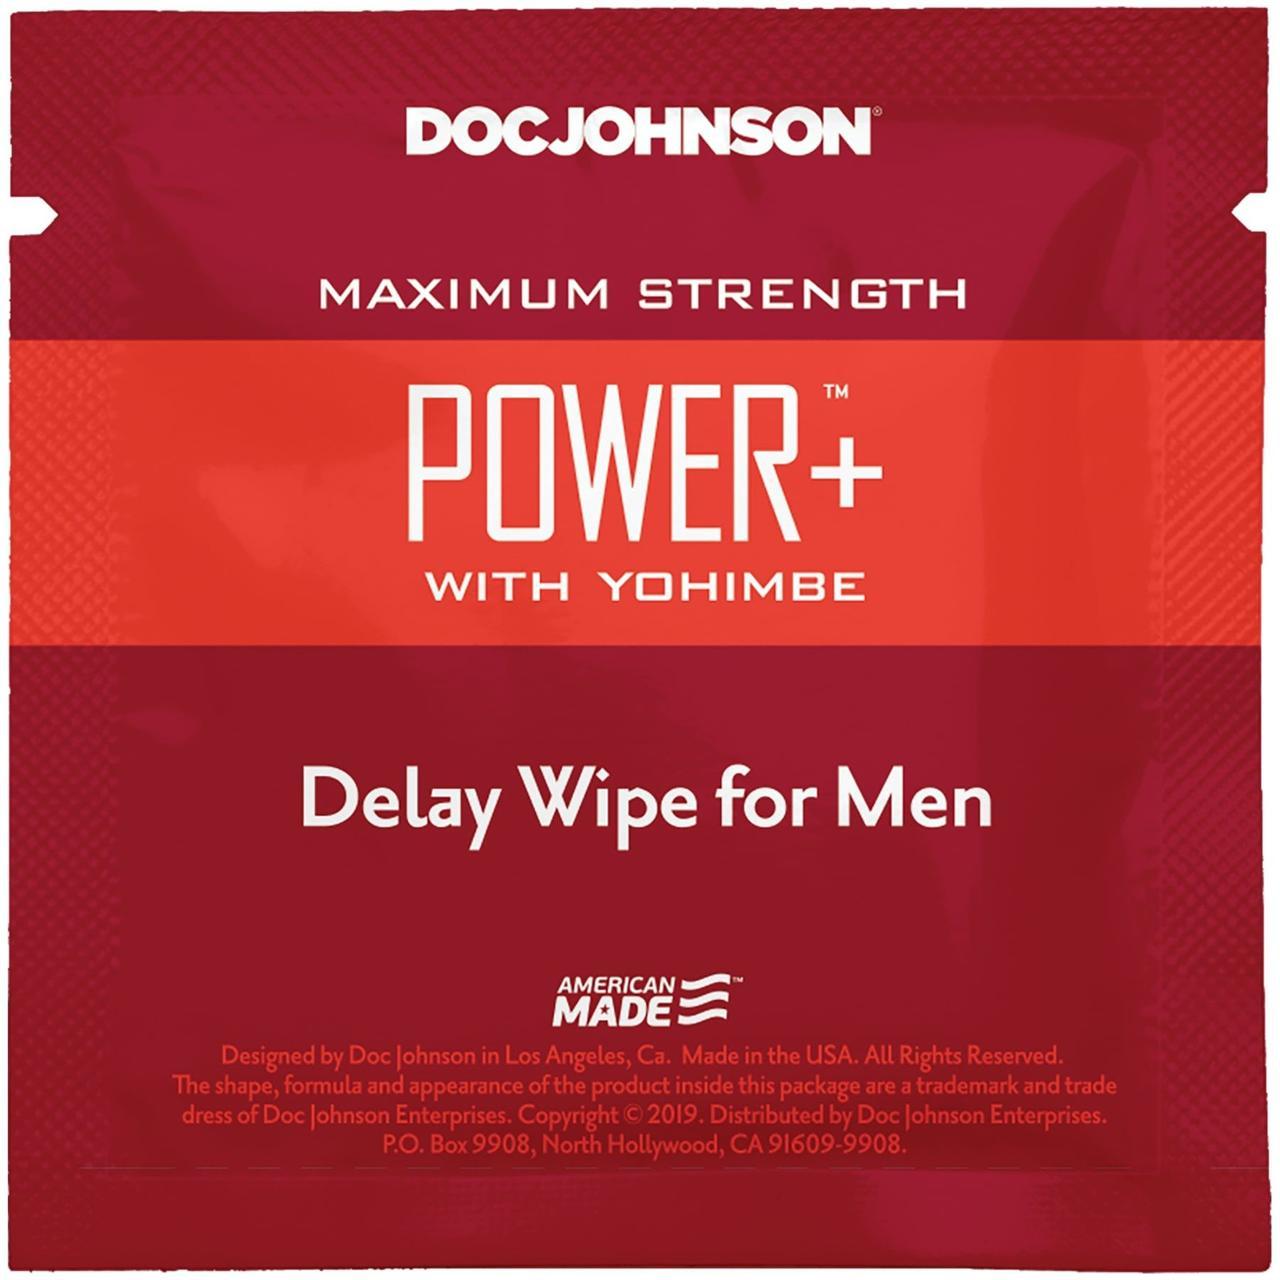 Пролонгирующая салфетка Doc Johnson Power+ Delay Wipe For Men с  экстрактом йохимбе SO3488